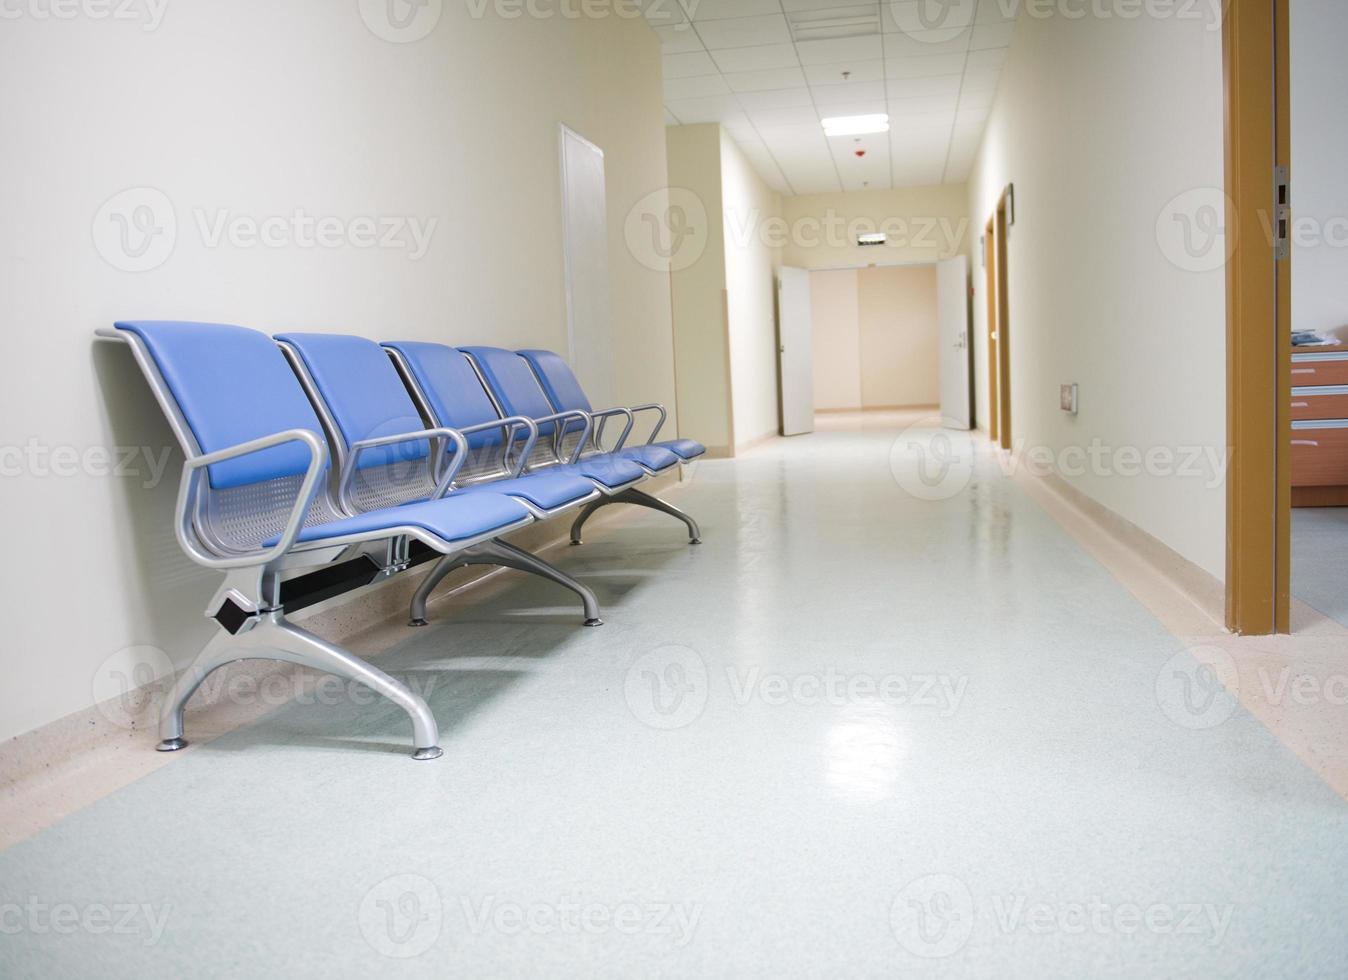 Innenraum eines leeren Krankenhausflurs foto